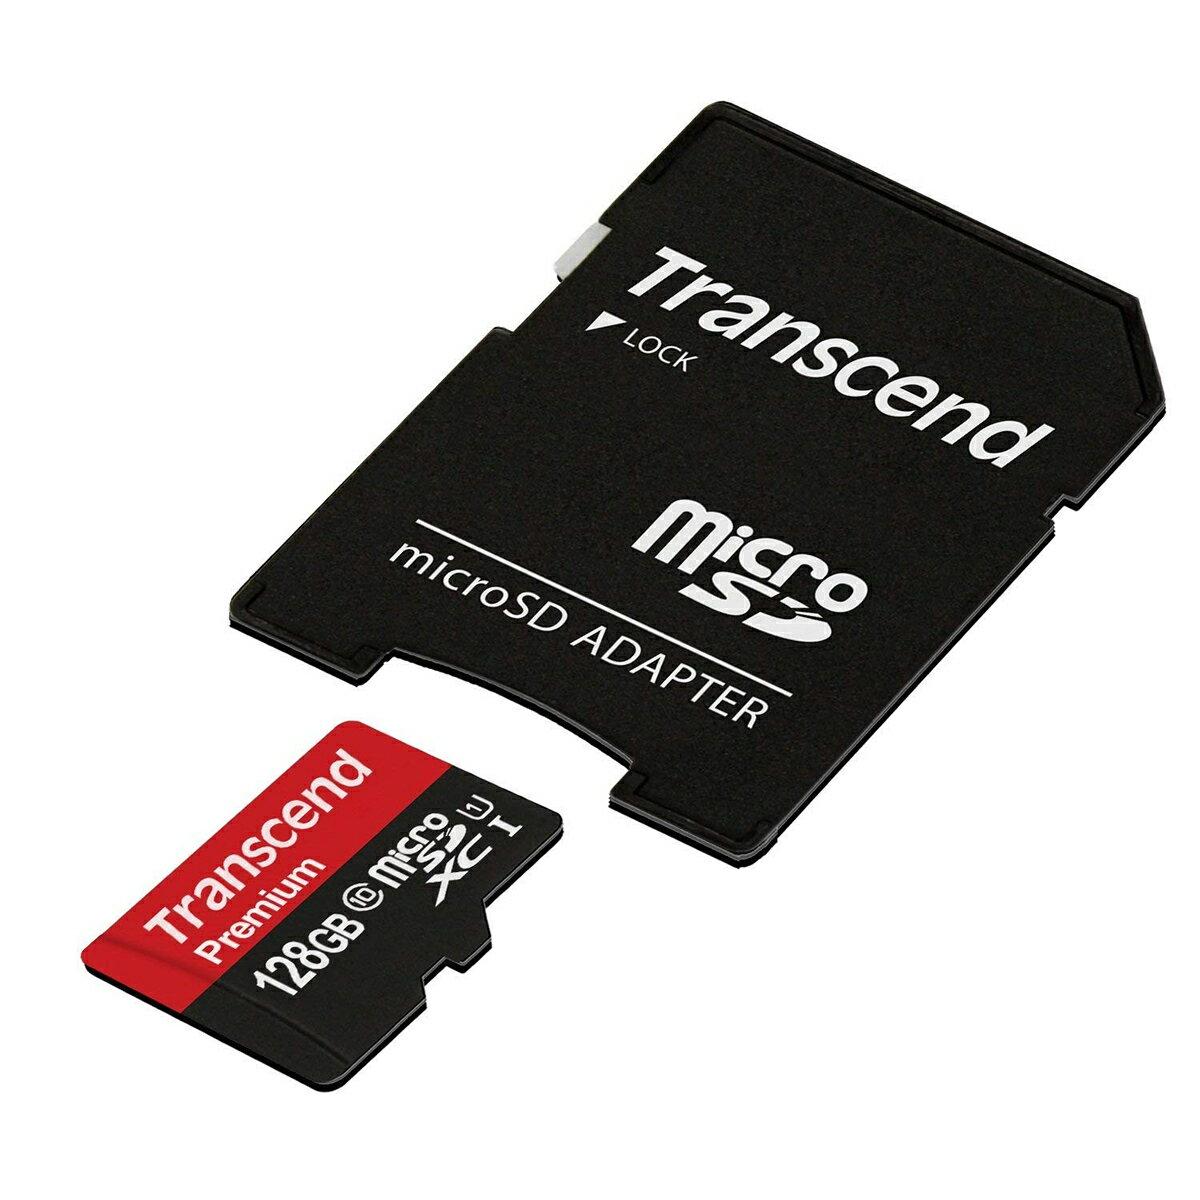 Transcend microSDカード 128GB Class10 UHS-1 5年保証 マイクロSD microSDXC SDアダプタ付 最大転送速度60MB/s 400x クラス10 入学 卒業[TS128GUSDU1]【ネコポス専用】【送料無料】